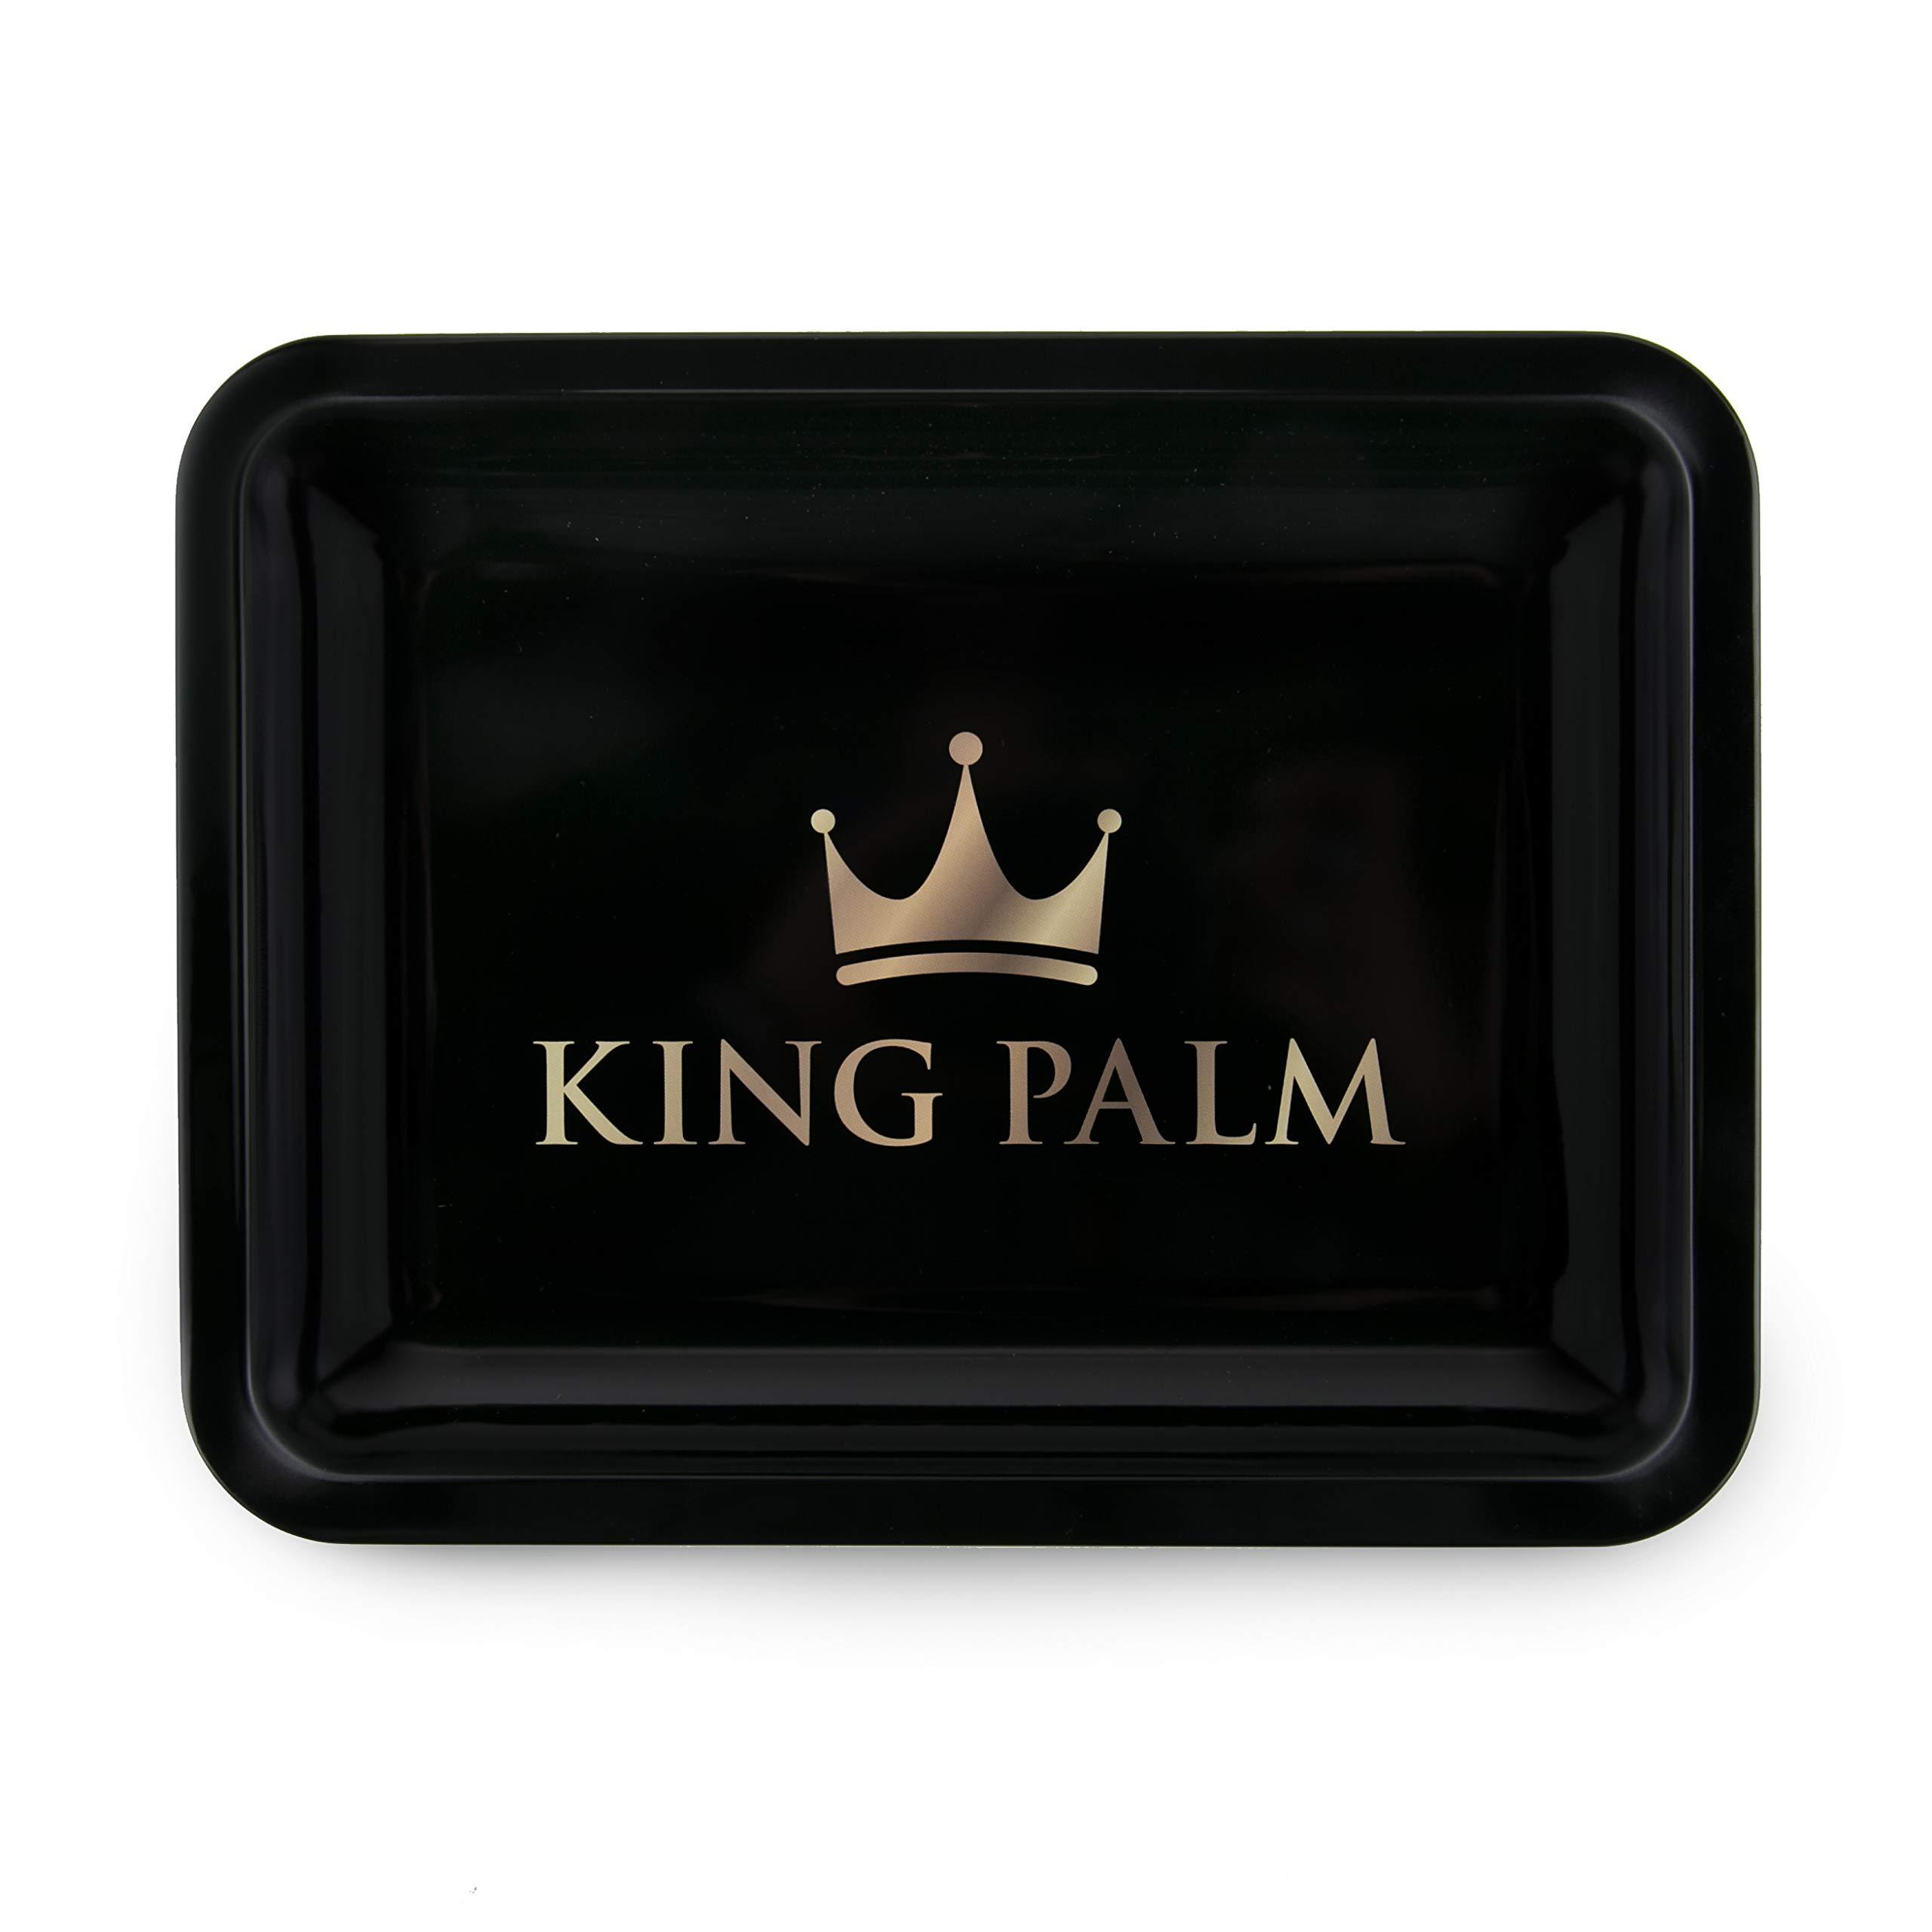 King Palm Metal Rolling Tray - Original - (Medium - 8'' x 10'') by King Palms